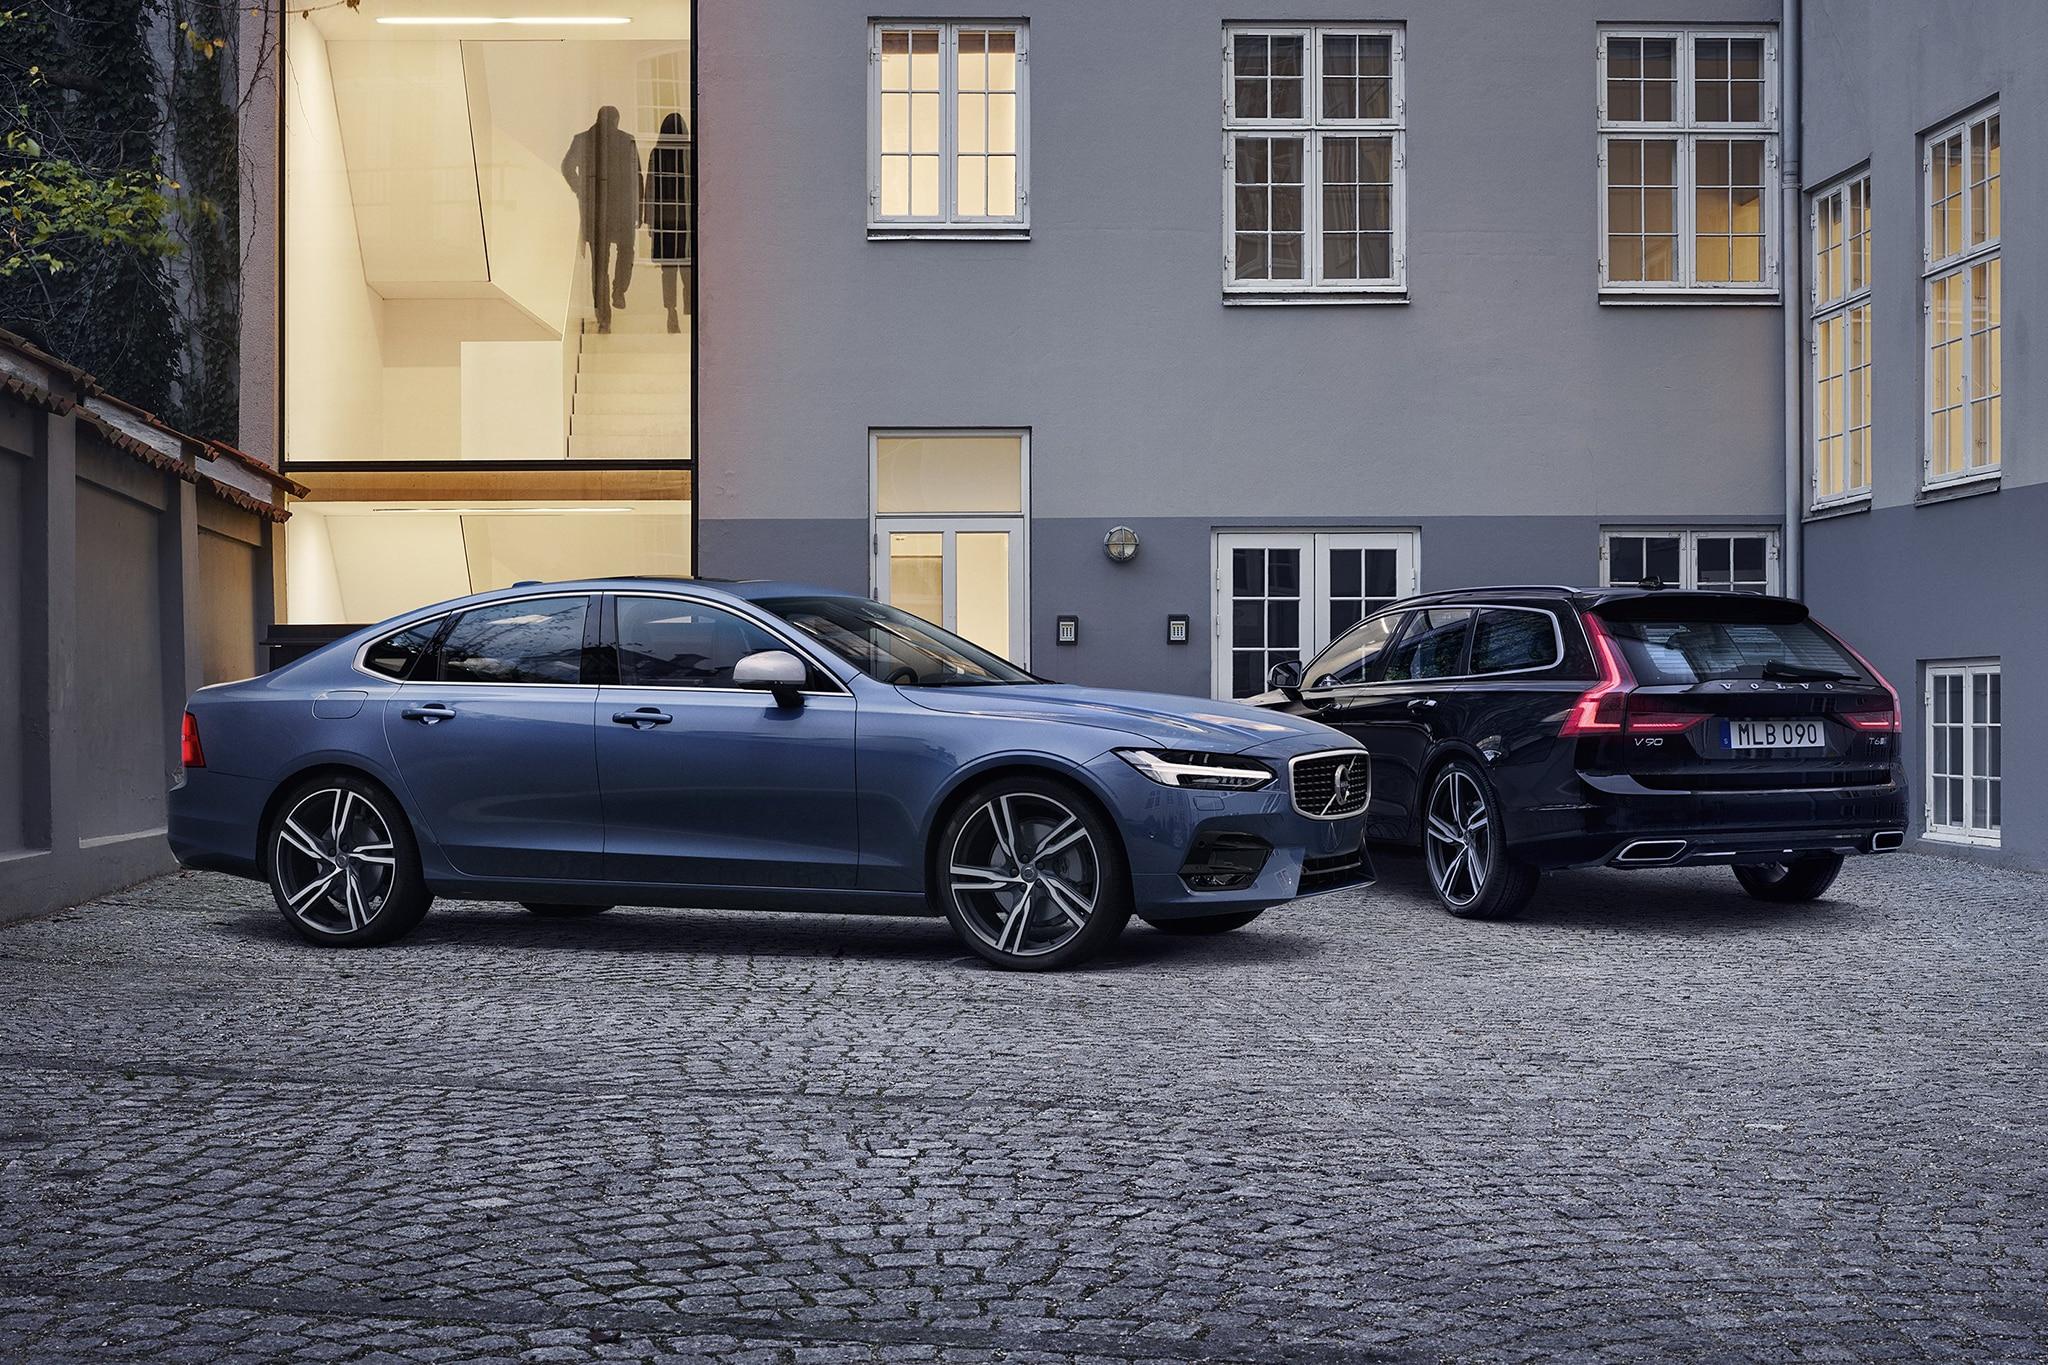 2017 Volvo S90 R Design And 2017 Volvo V90 R Design 01